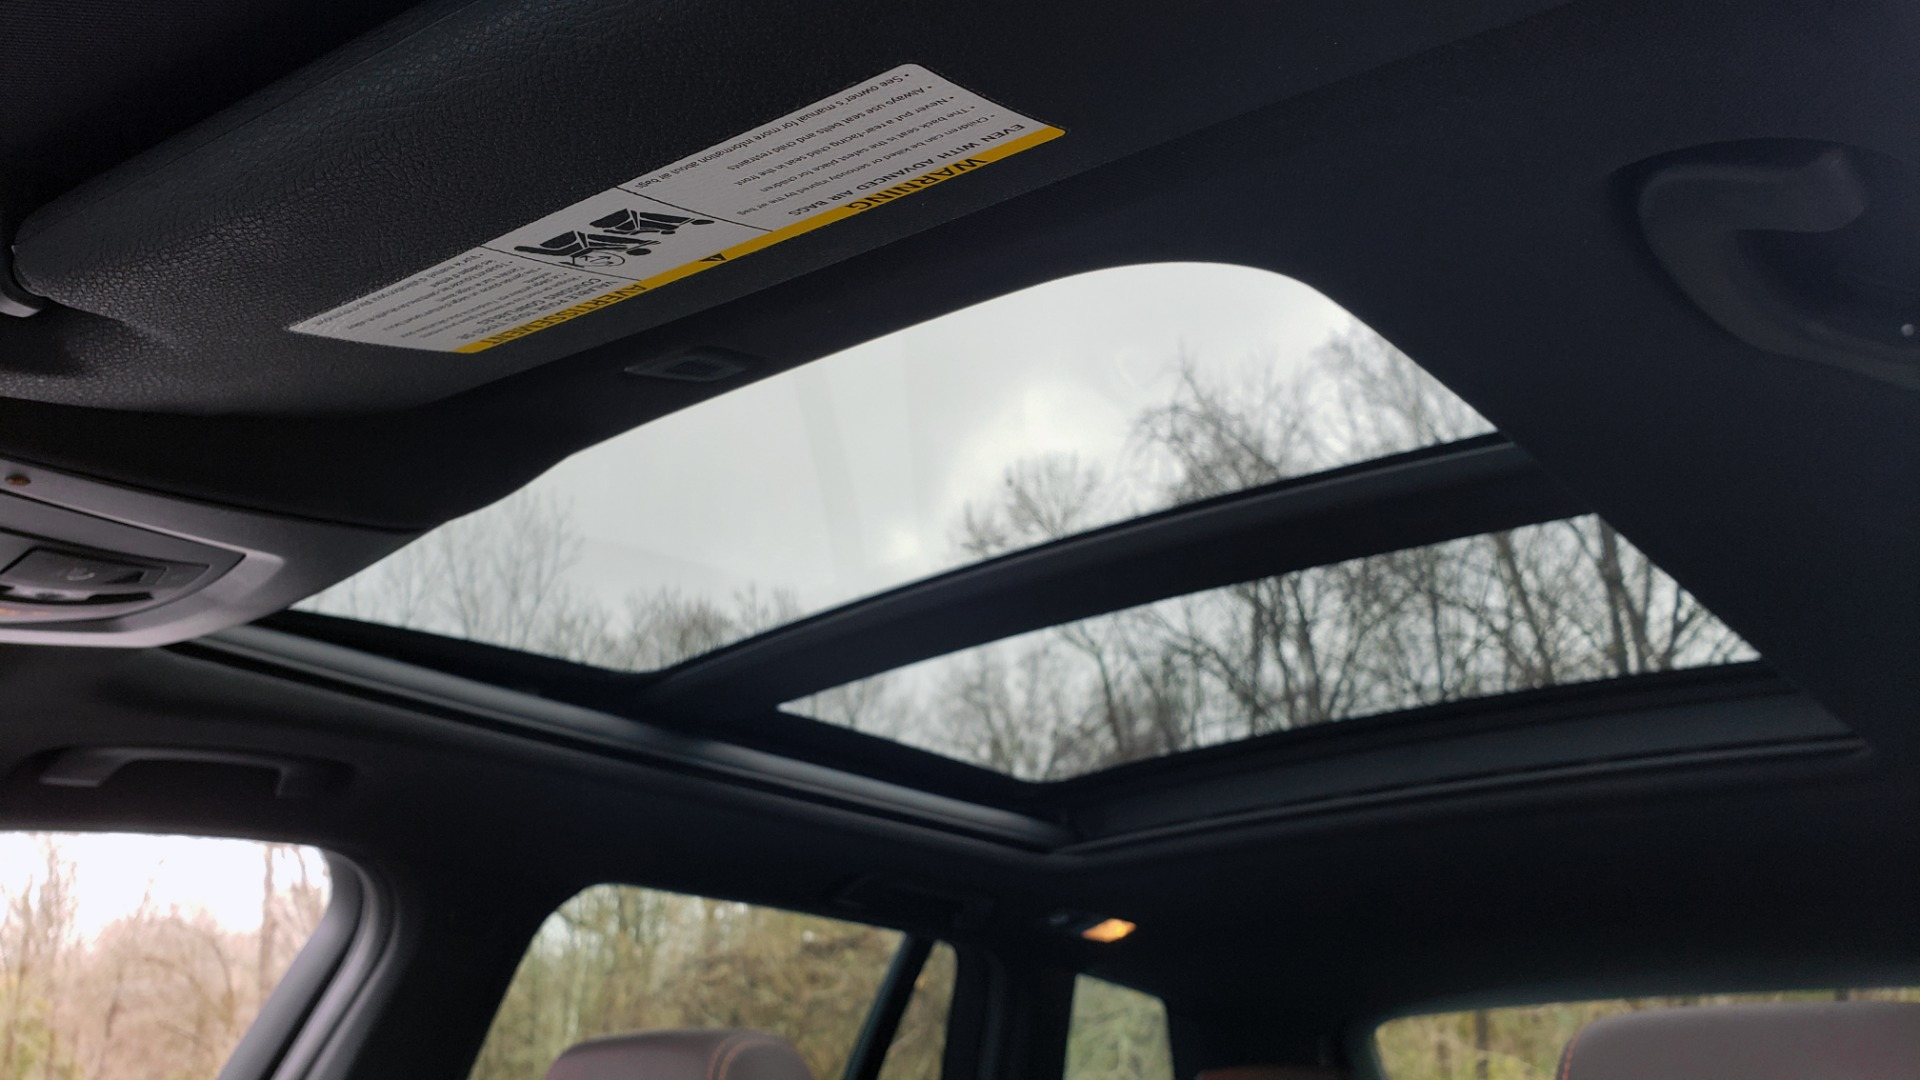 Used 2017 BMW X3 XDRIVE35I M-SPORT / DRVR ASST PLUS / TECHNOLOGY / HUD / BLIND SPOT for sale Sold at Formula Imports in Charlotte NC 28227 25